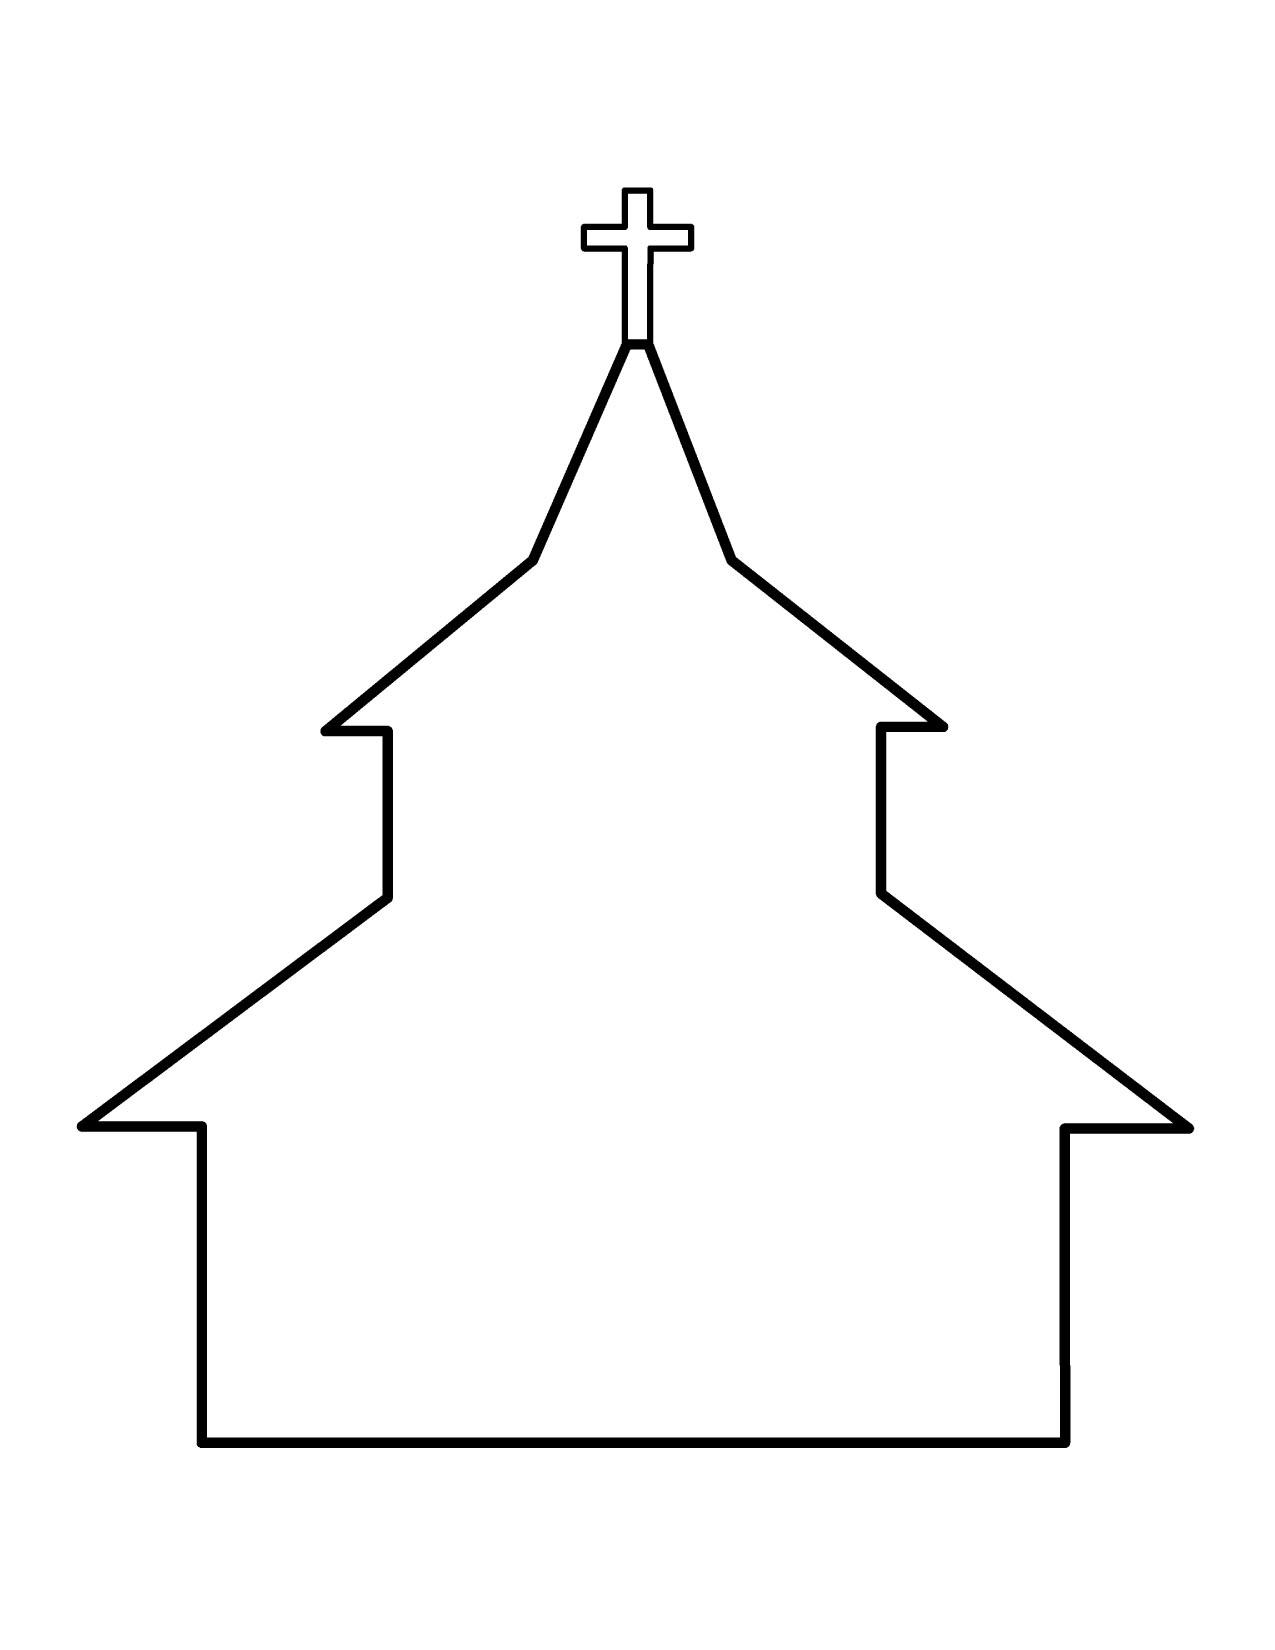 nativity scene clipart black and white free download best nativity